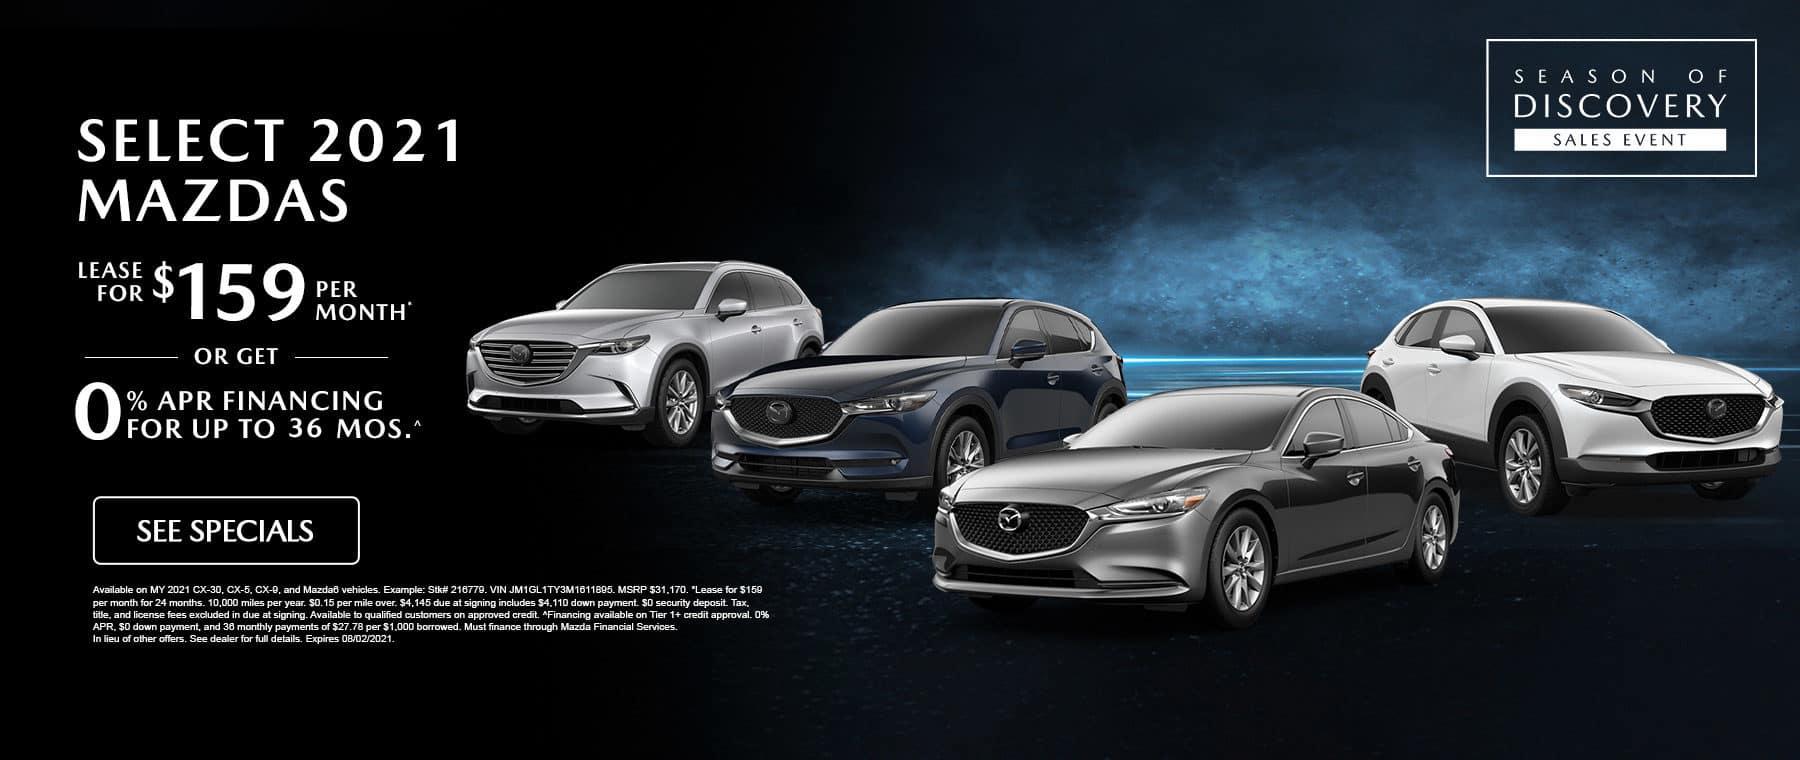 MazdaofGastonia_SelectMazdasIncentive_1800x760_07-21